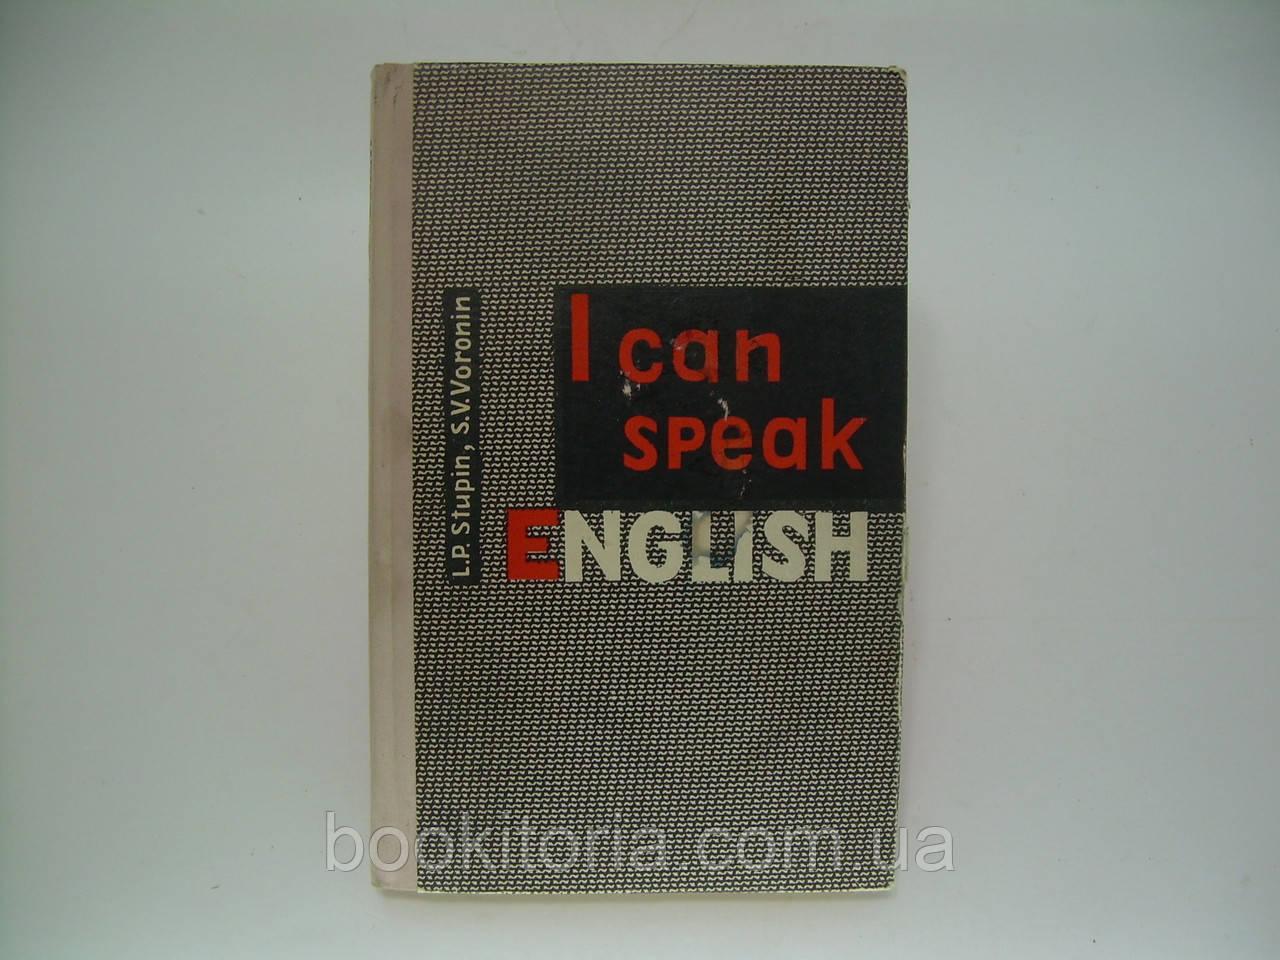 Stupin L., Voronin S. I can speak english (б/у).